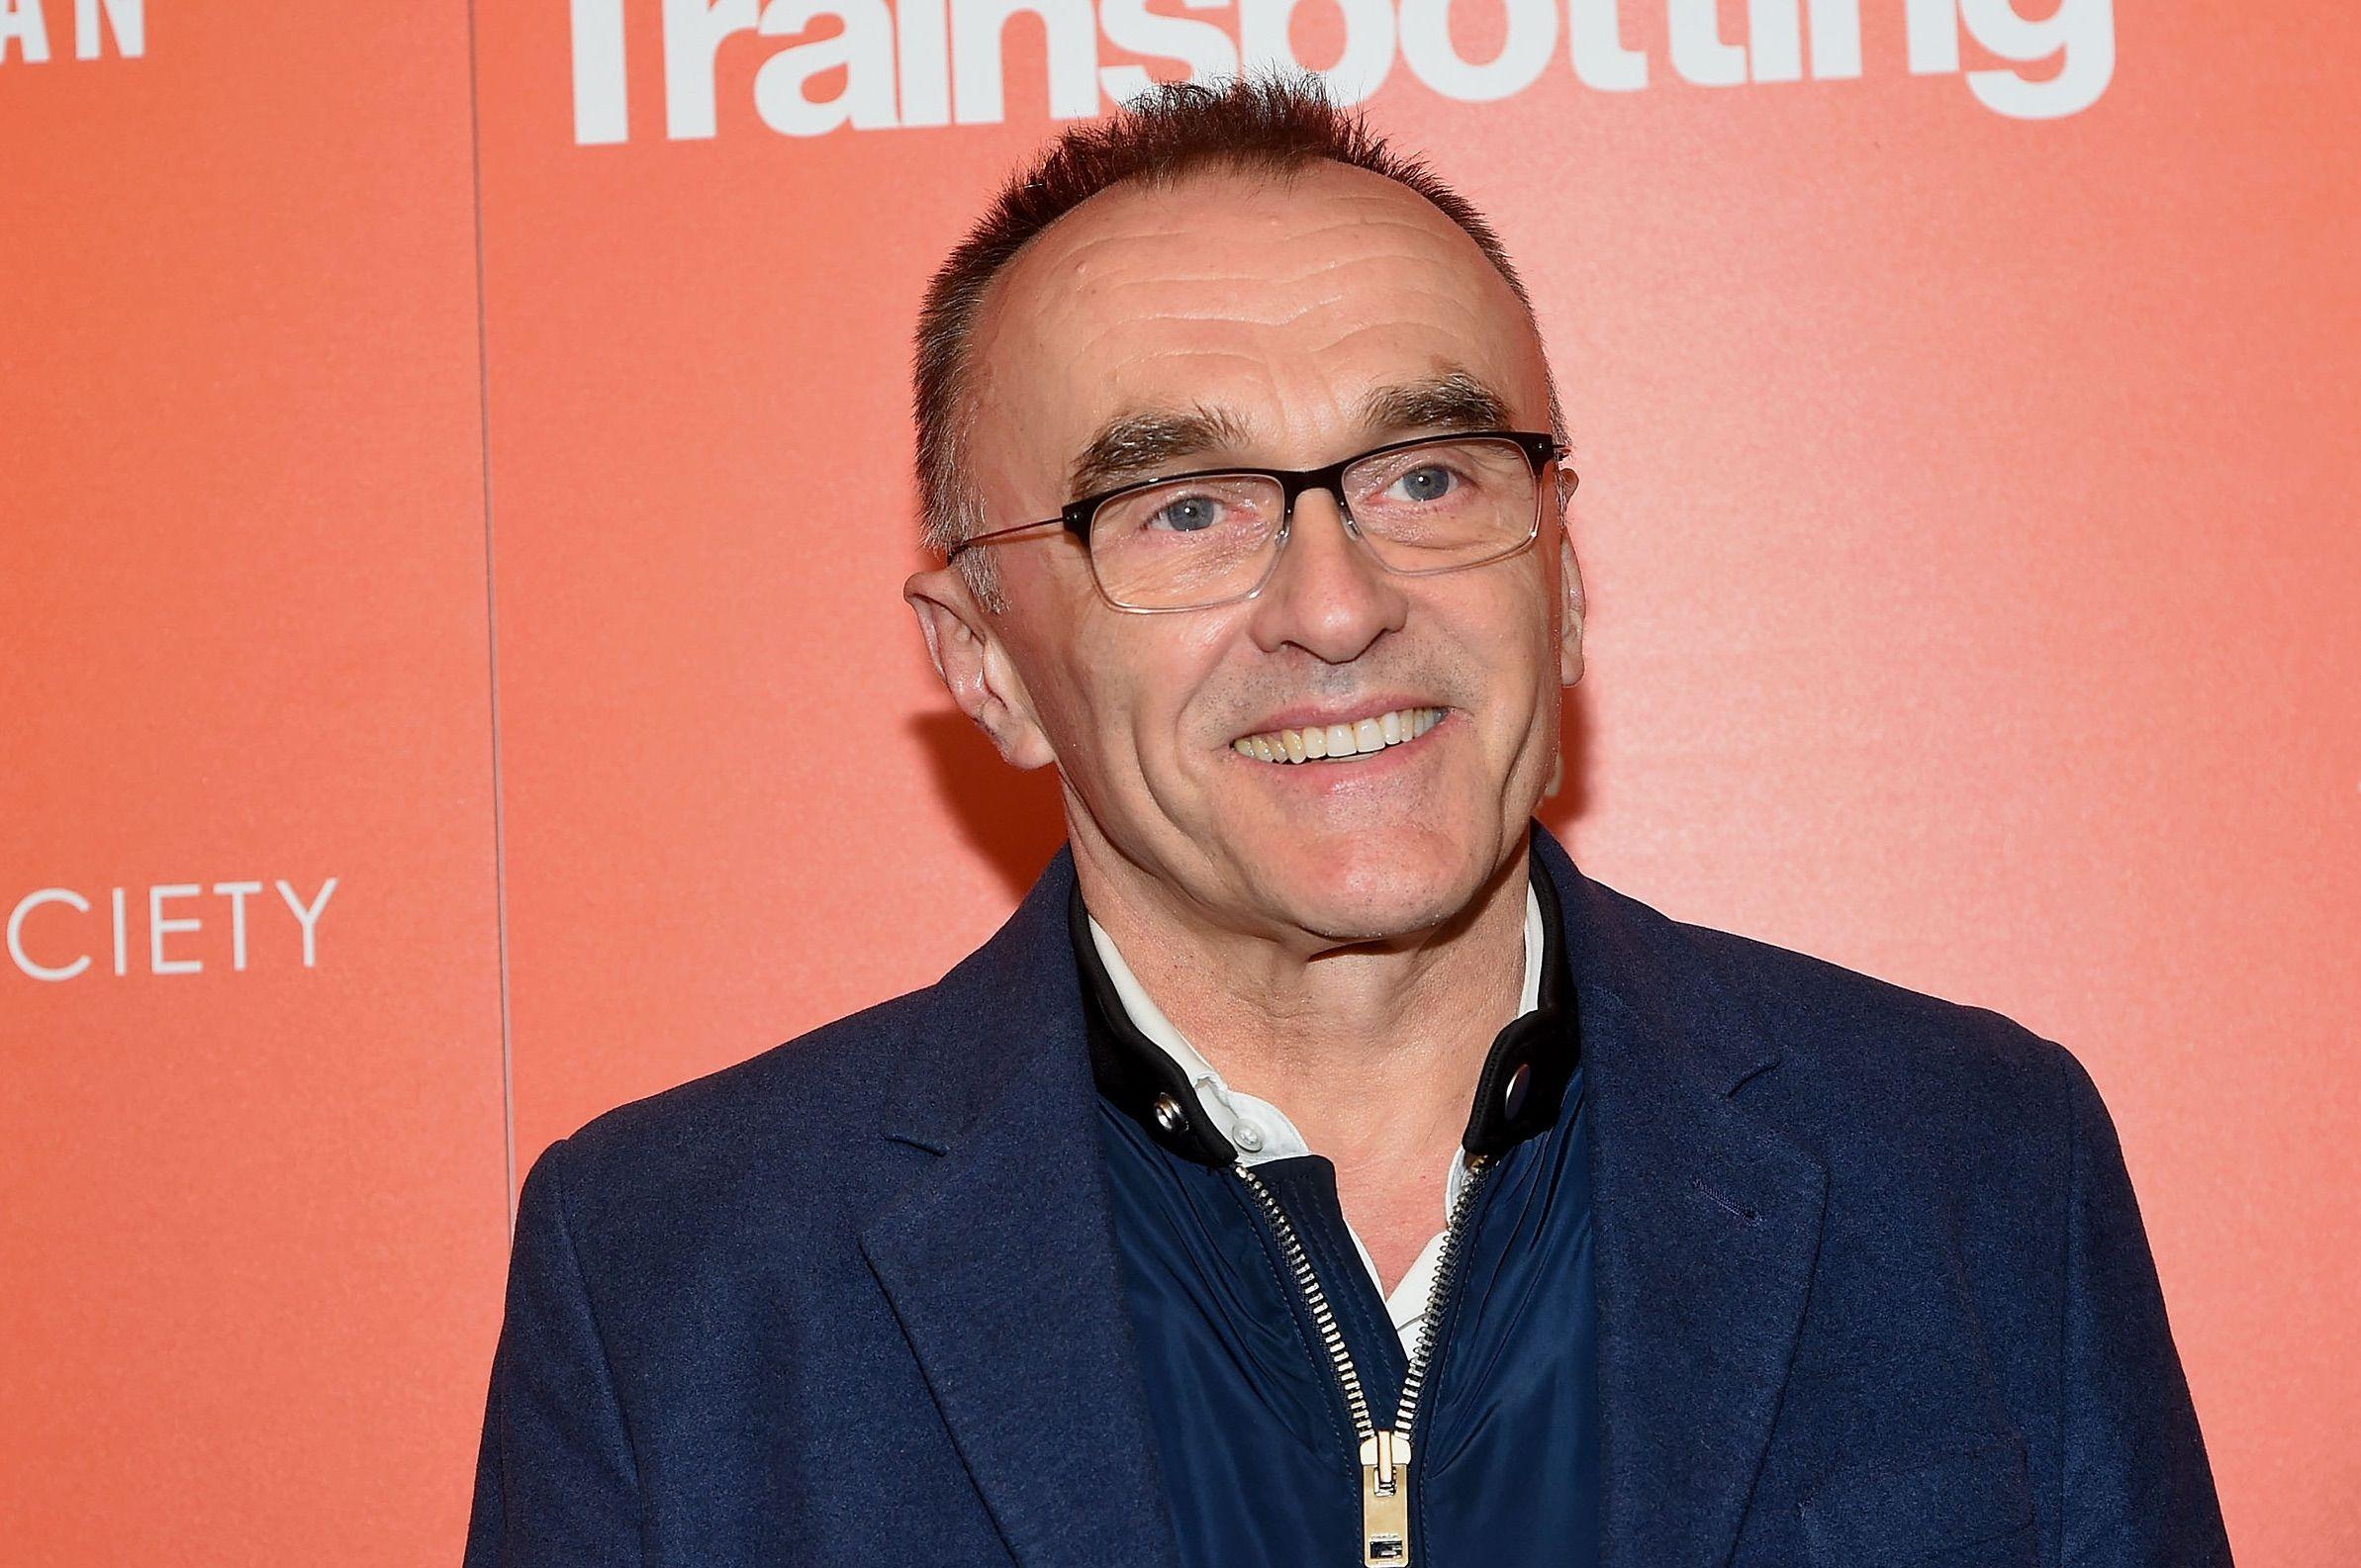 Danny Boyle announces he's directing the new James Bond movie